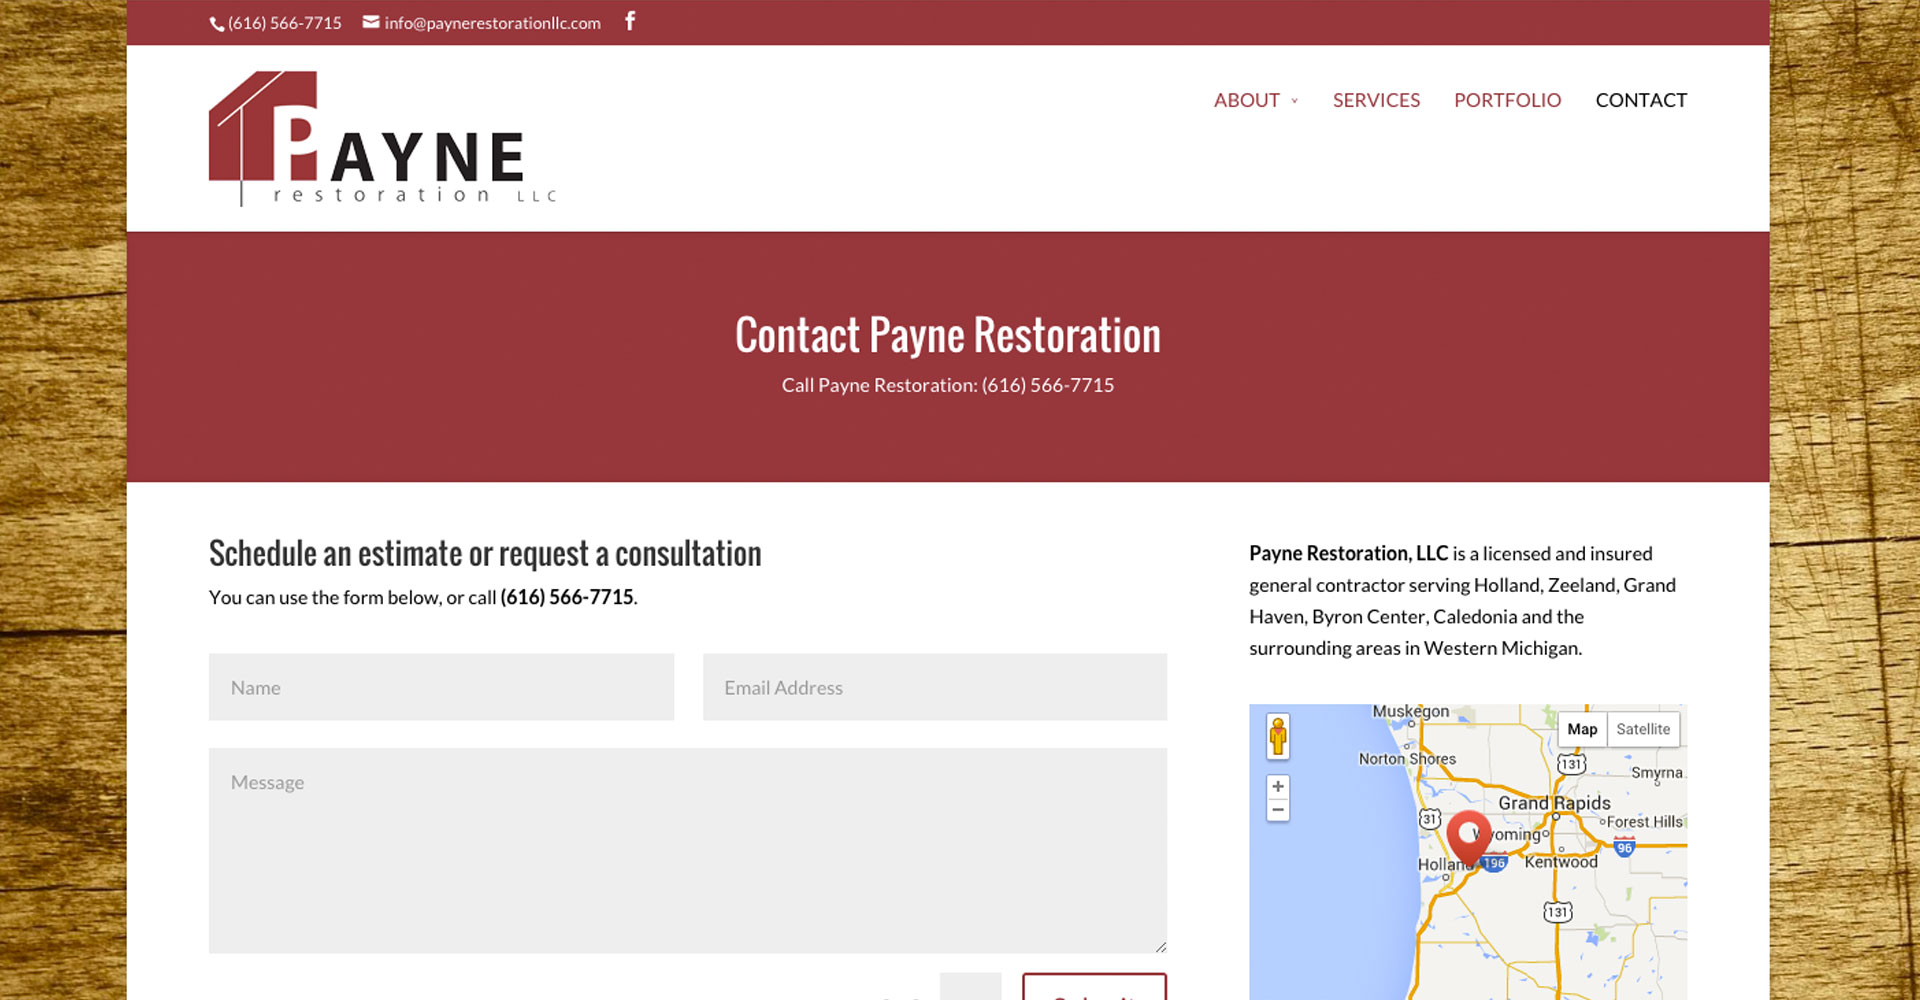 payne-resto-contact